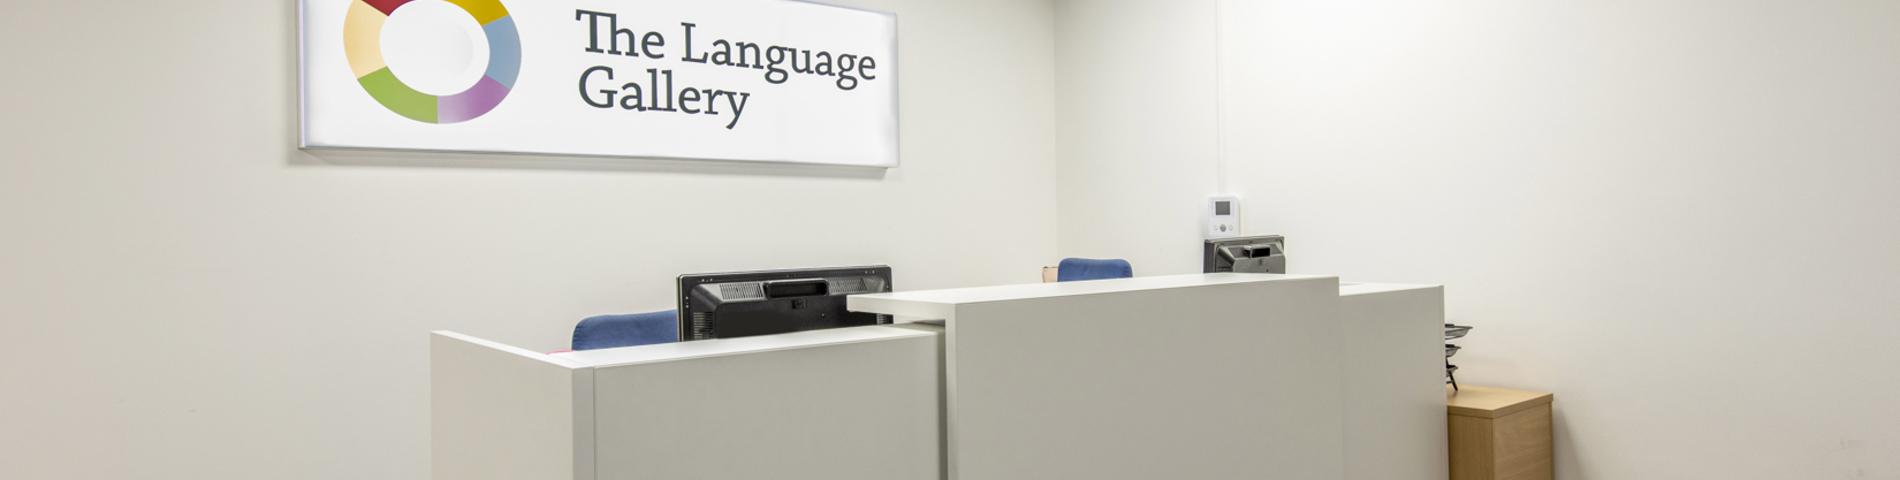 The Language Gallery bild 1